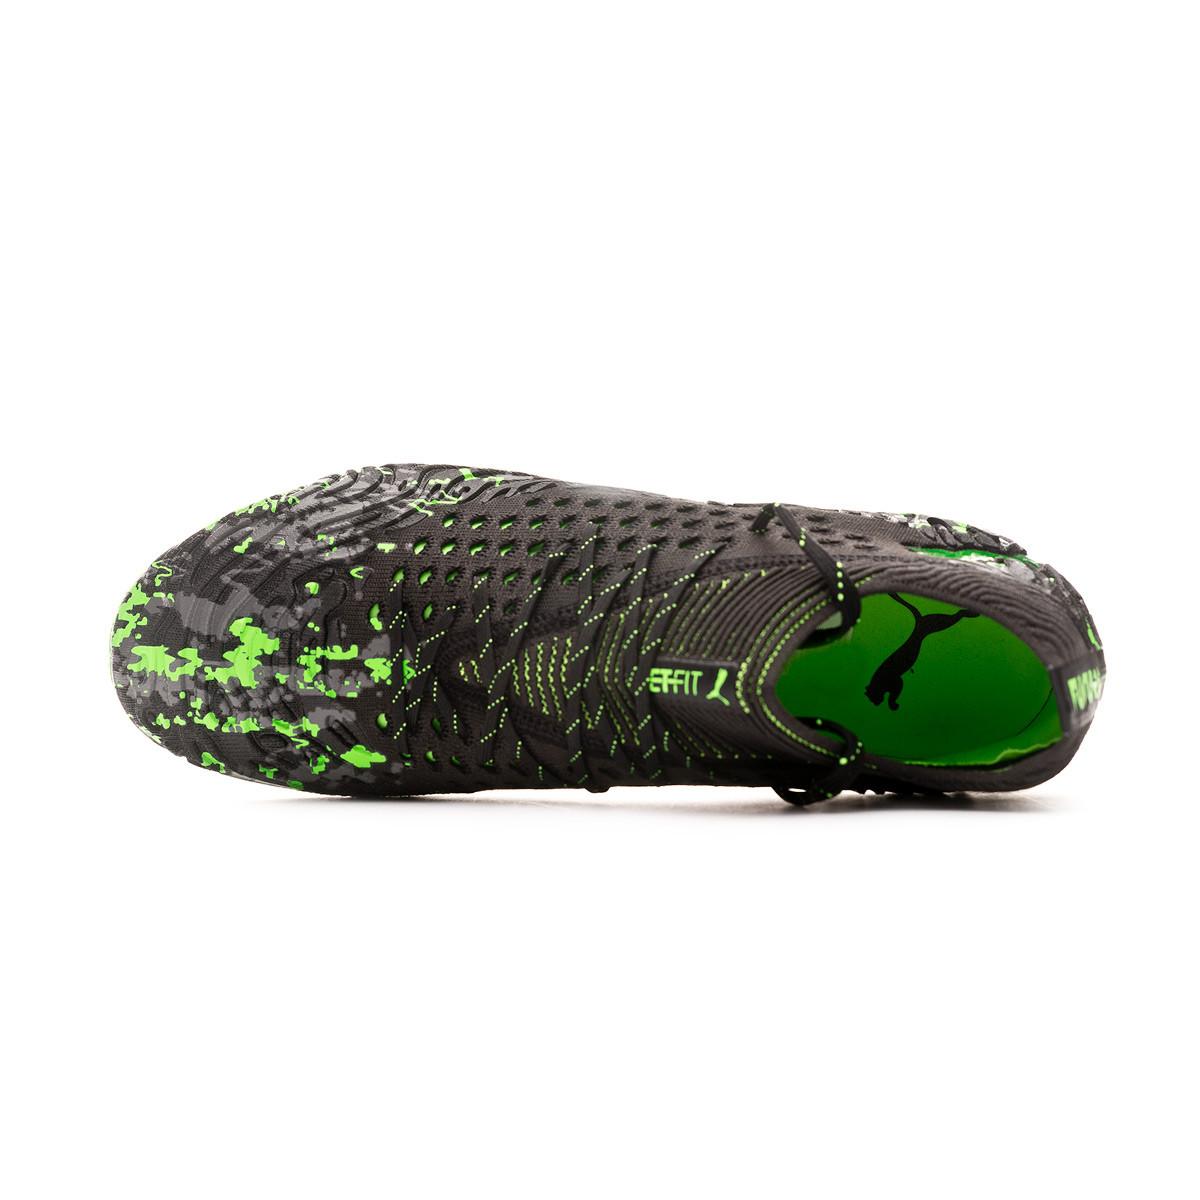 Bota Future 19.1 Netfit MG Puma black Charcoal gray Green gecko